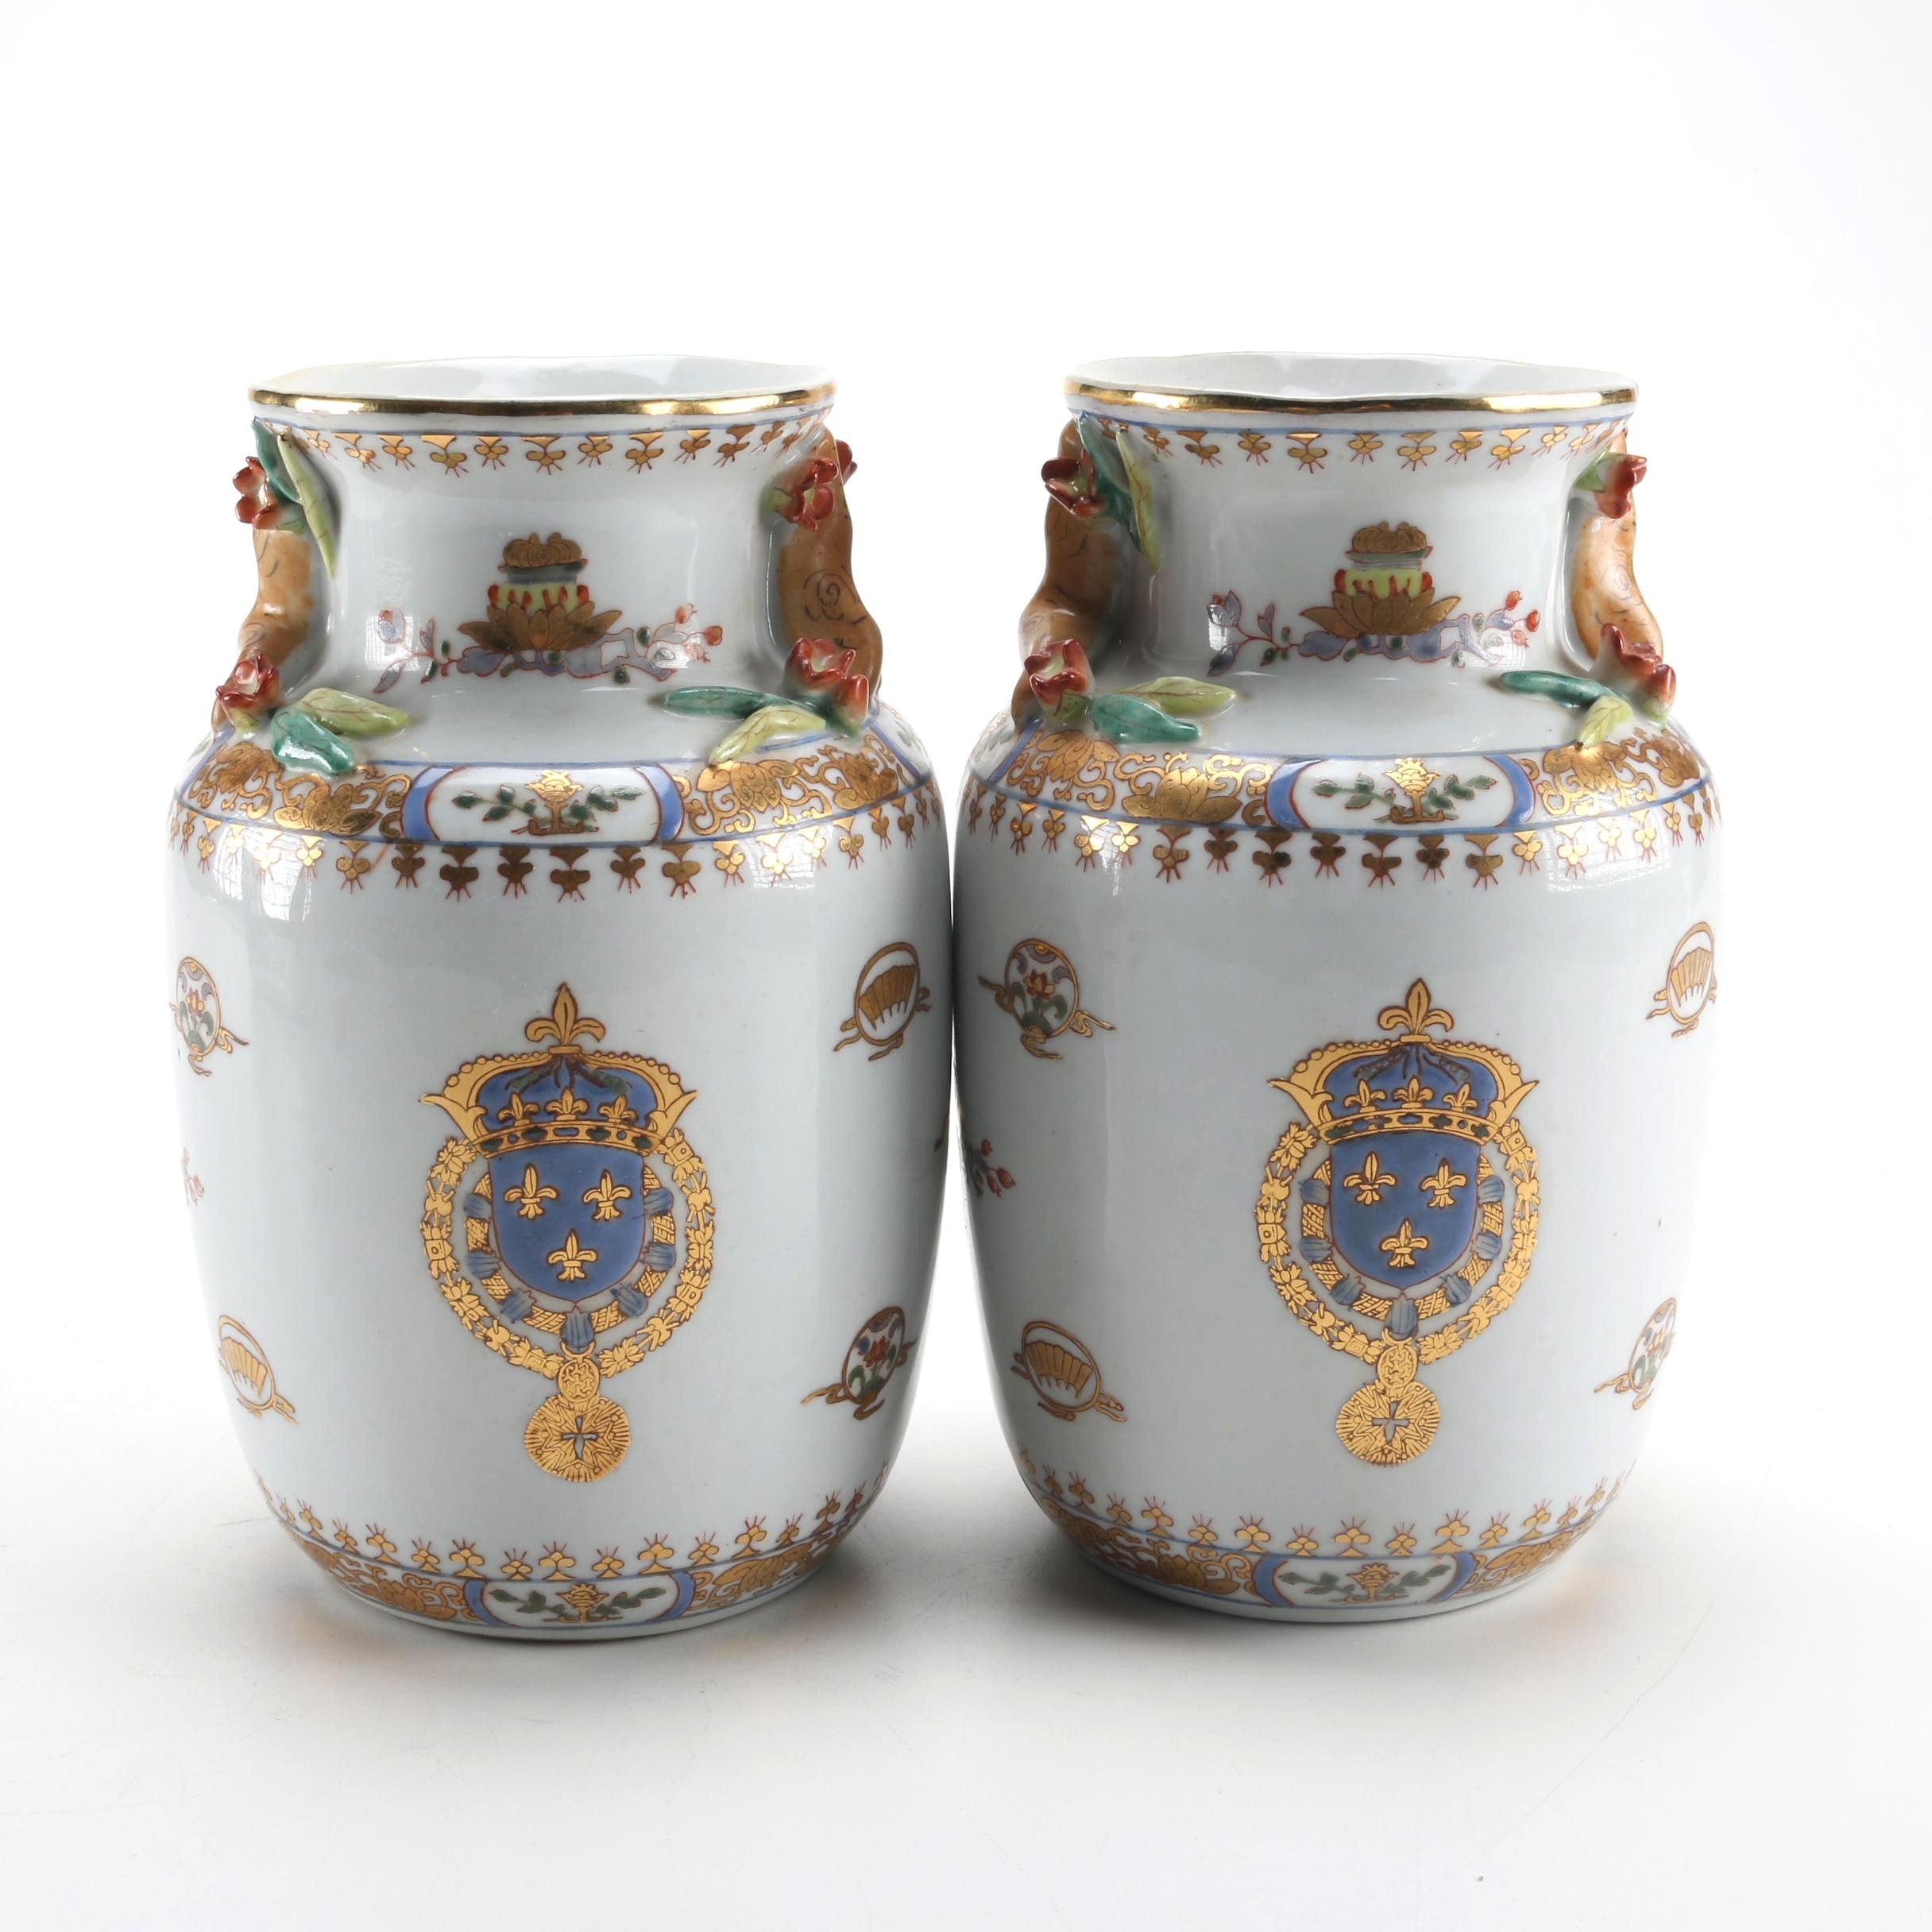 Ceramic Asian Inspired Urns